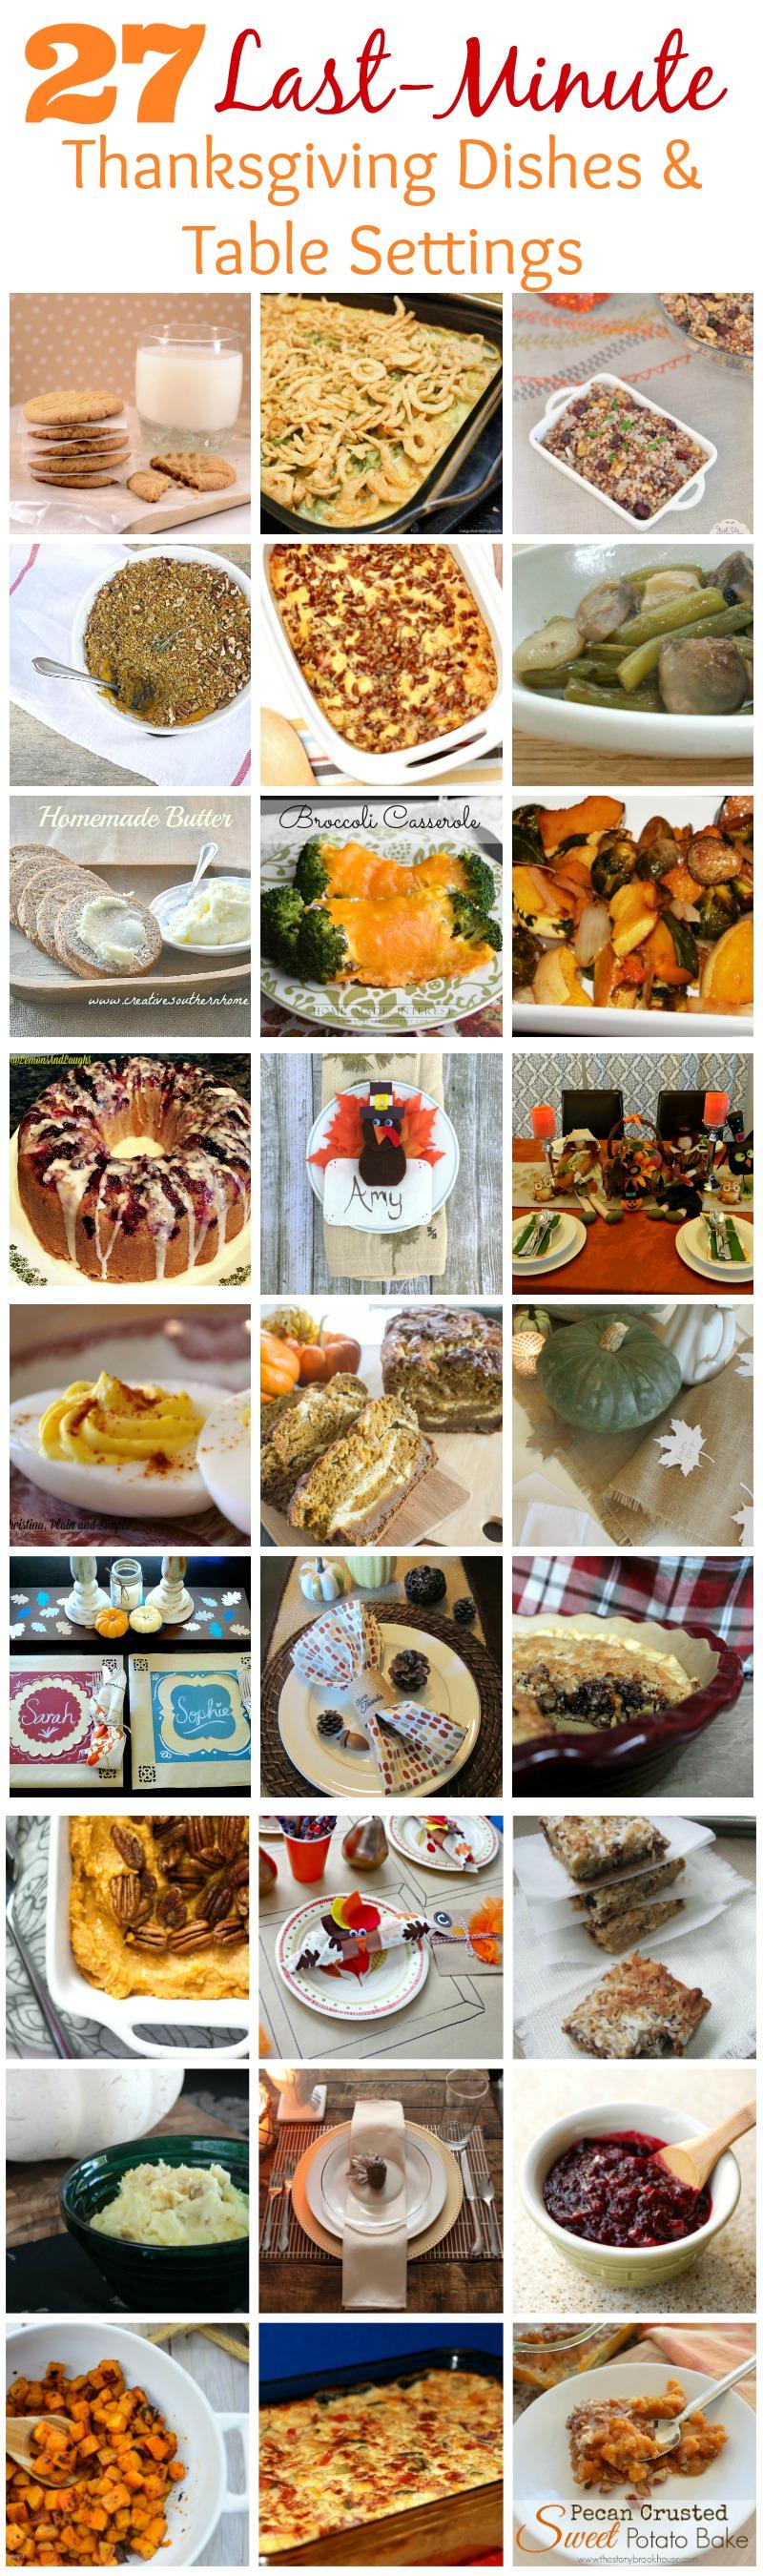 27 Last Minute Thanksgiving Dishes & Table Settings  |  Sweet Tea & Saving Grace